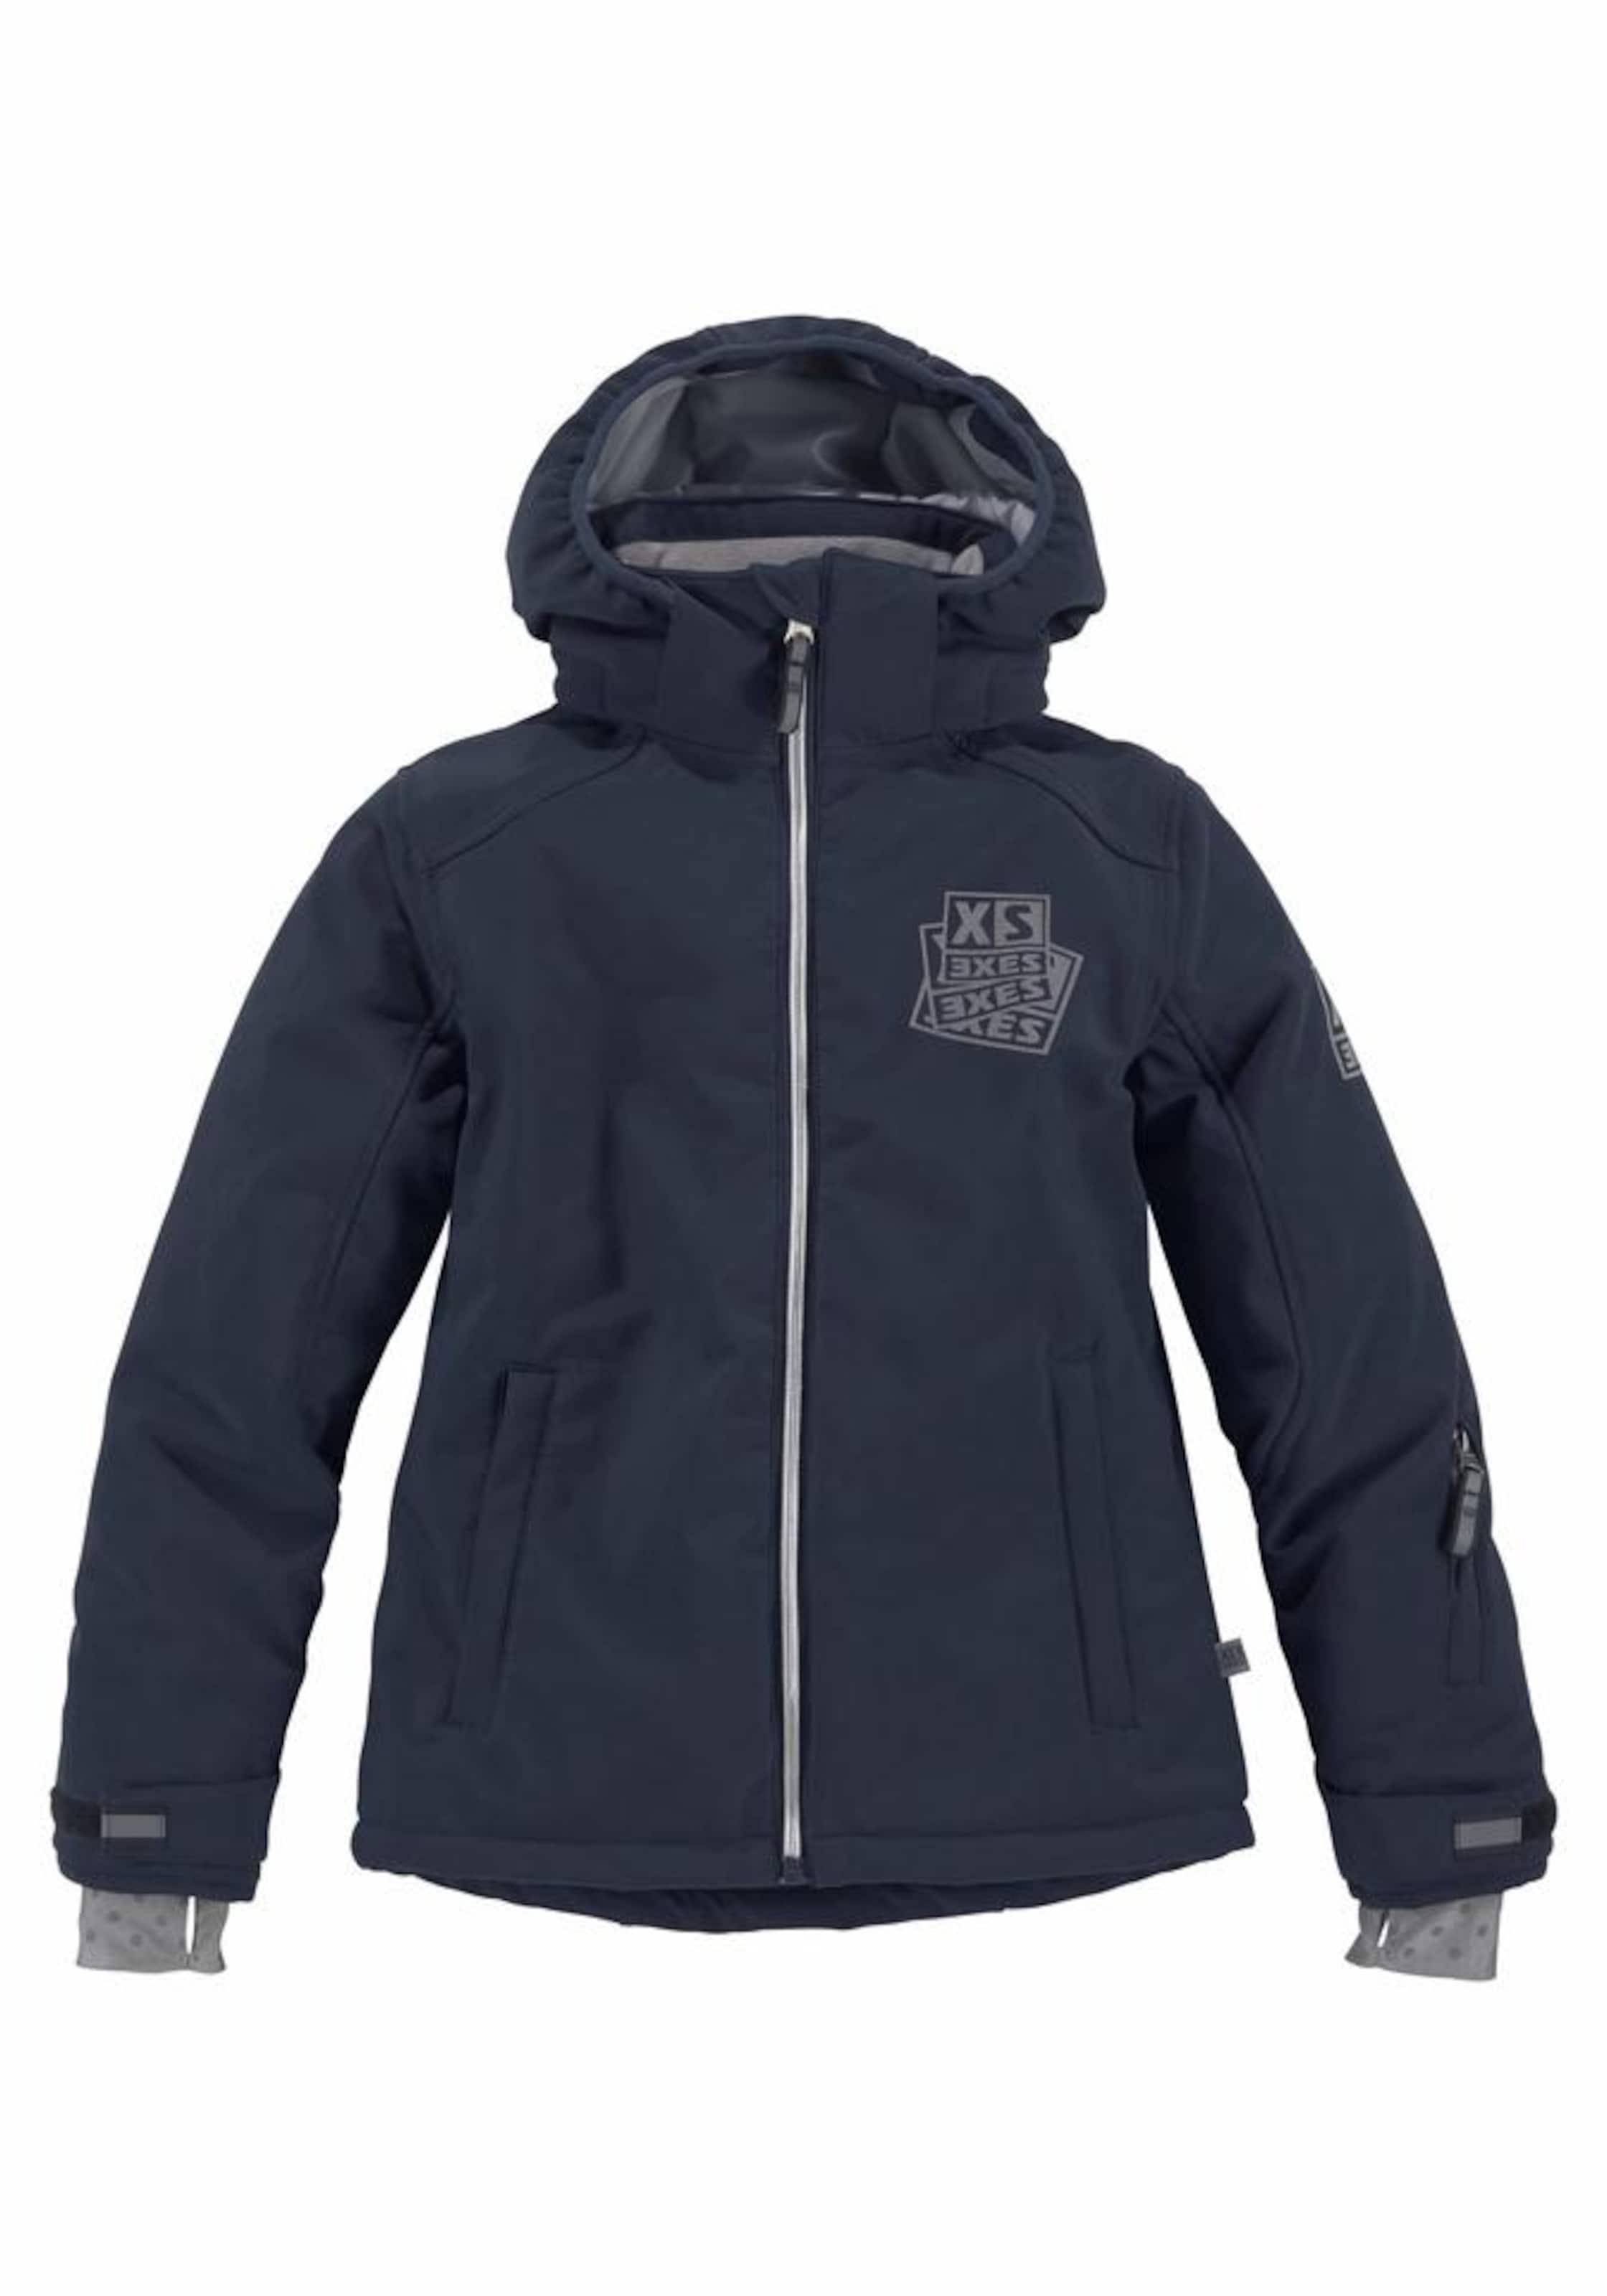 Jungen,  Kinder,  Kinder EXES Jacke blau,  grau, grau | 04043247742964